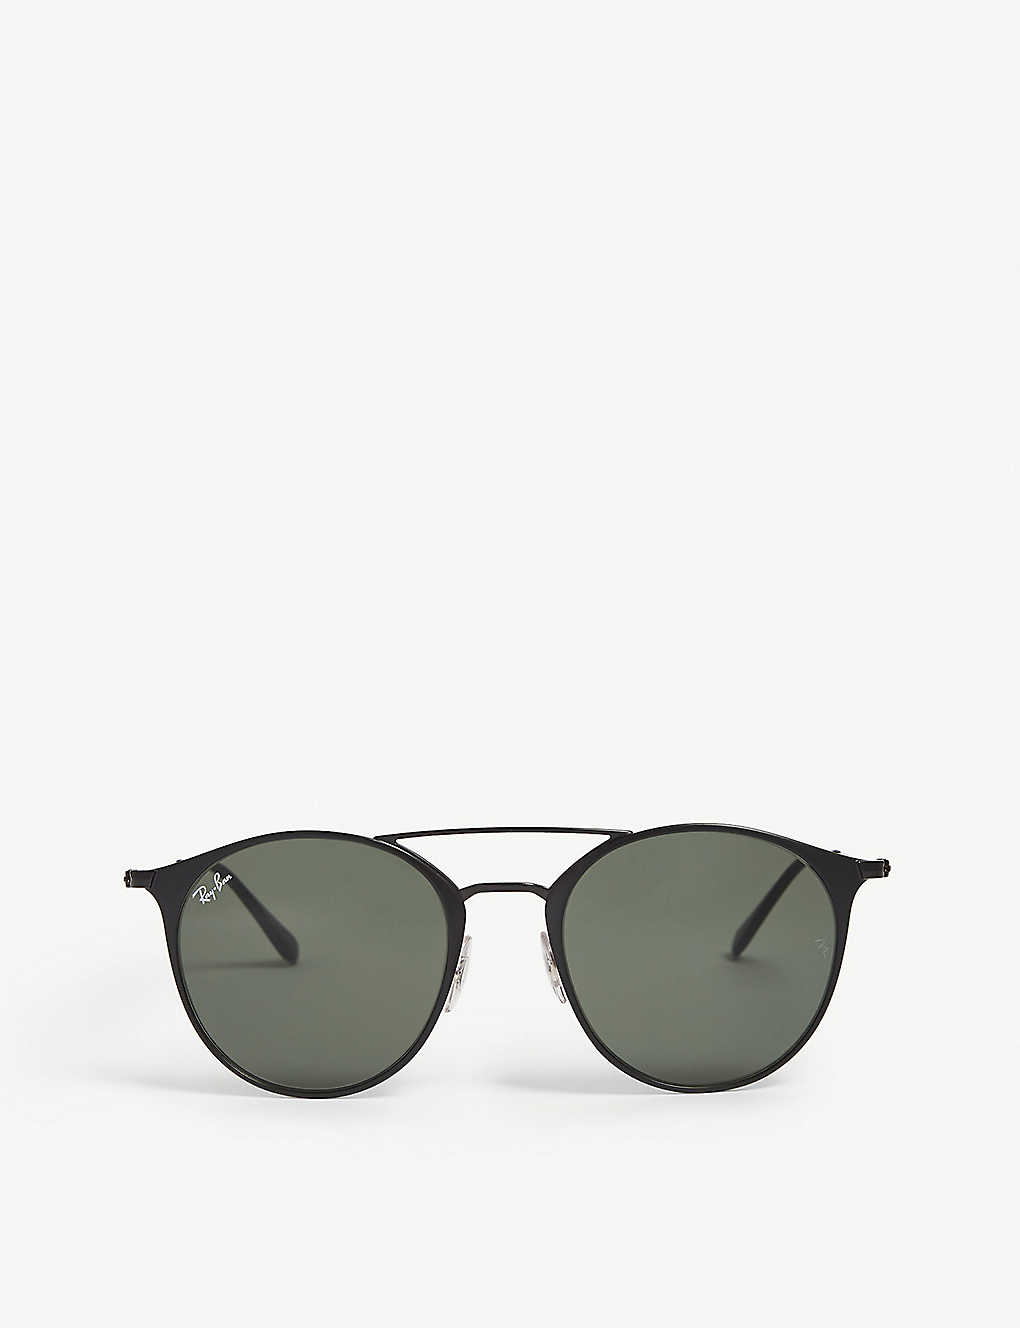 b3ef02bd68037 RAY-BAN - RB3447 metal round sunglasses